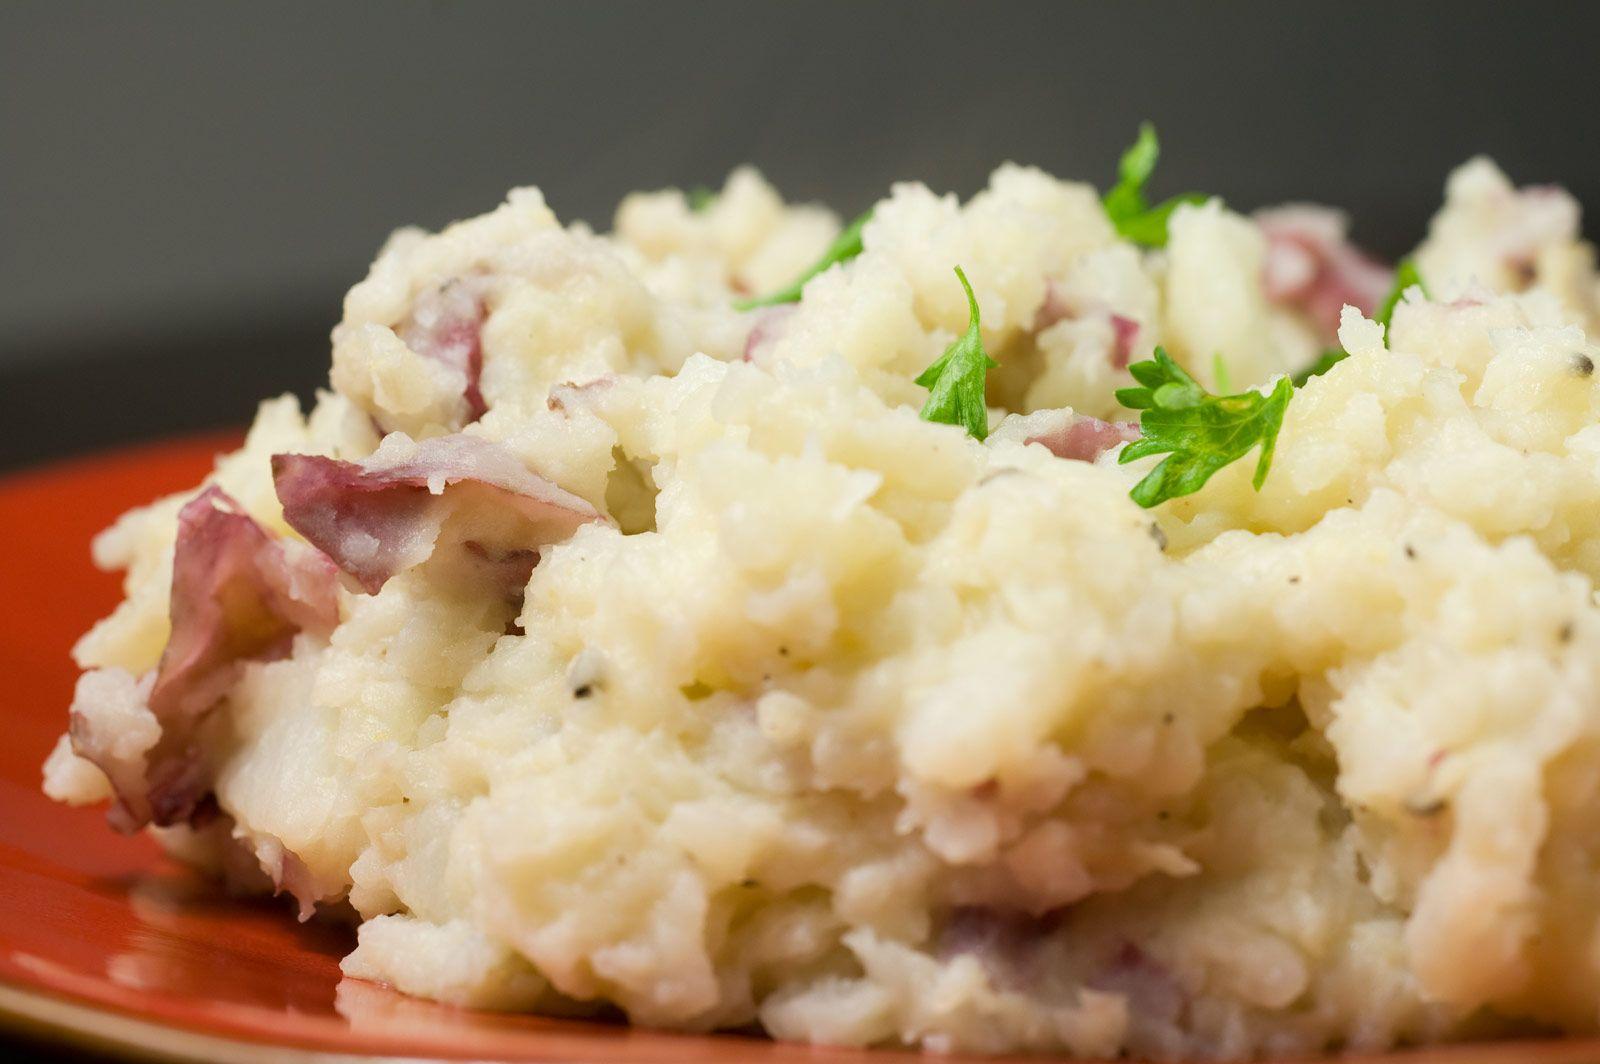 Creamy Mashed Potatoes Recipe Mashed Red Potatoes Garlic Red Mashed Potatoes Roasted Garlic Mashed Potatoes